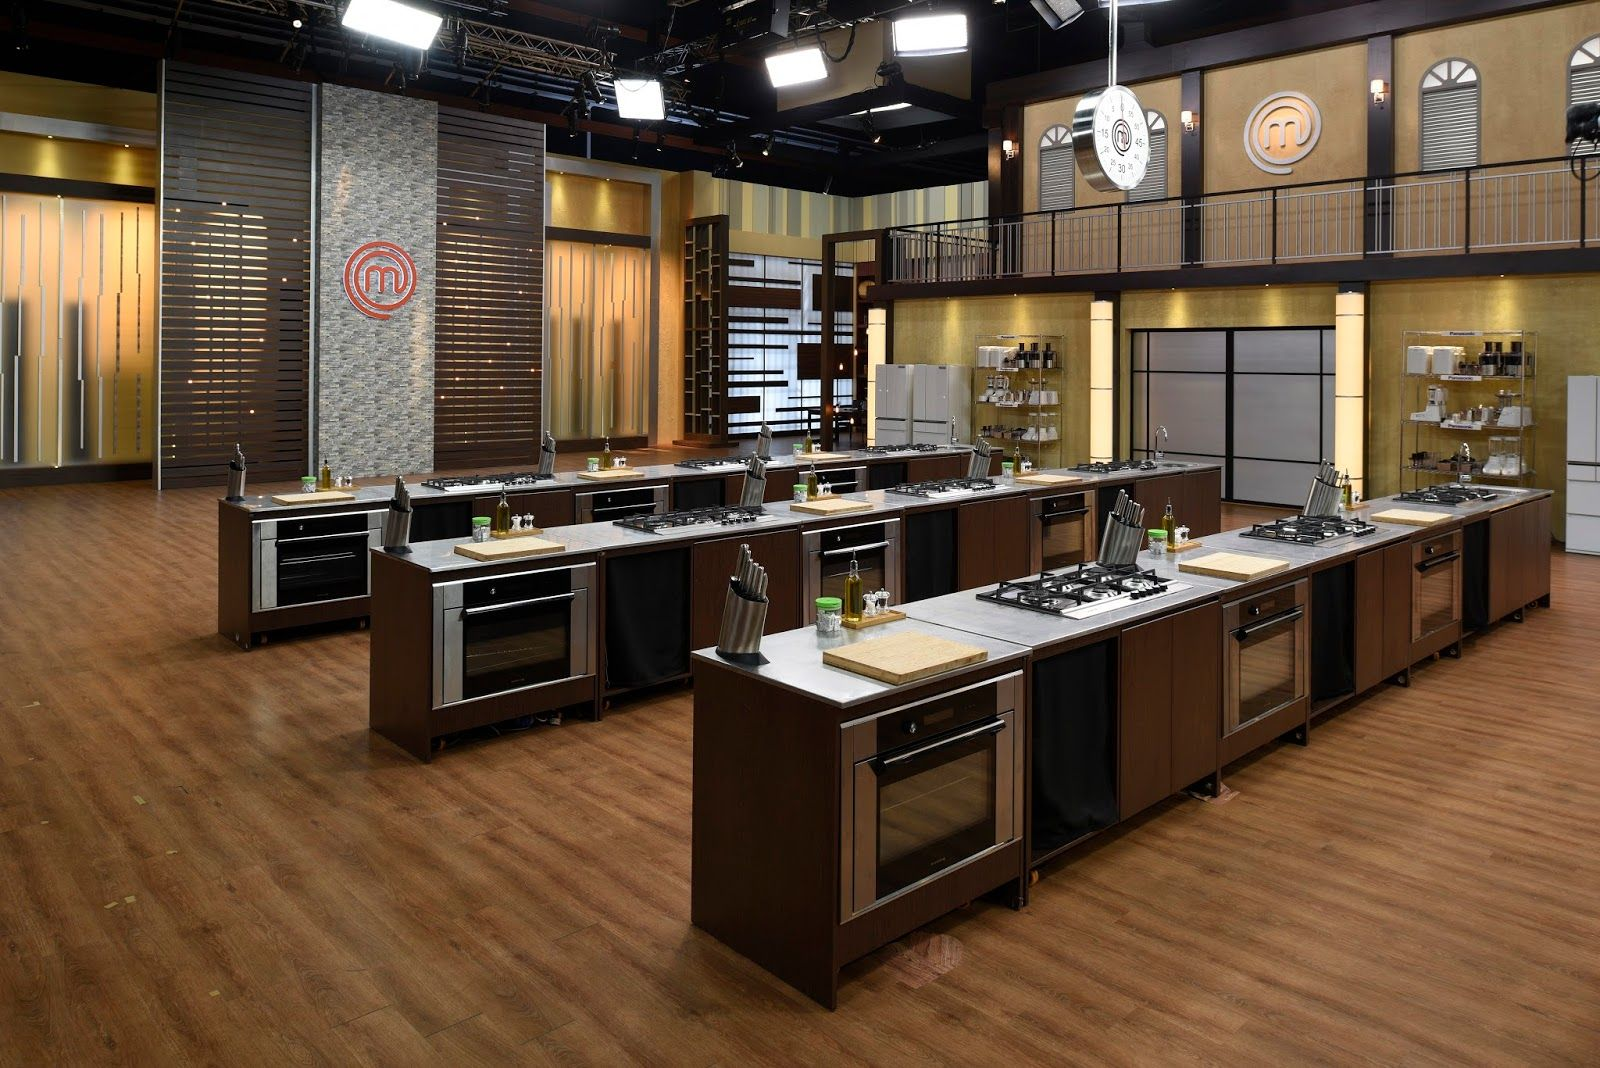 masterchef kitchen - Google Search | Mid-Victorian Remodel Ideas ...